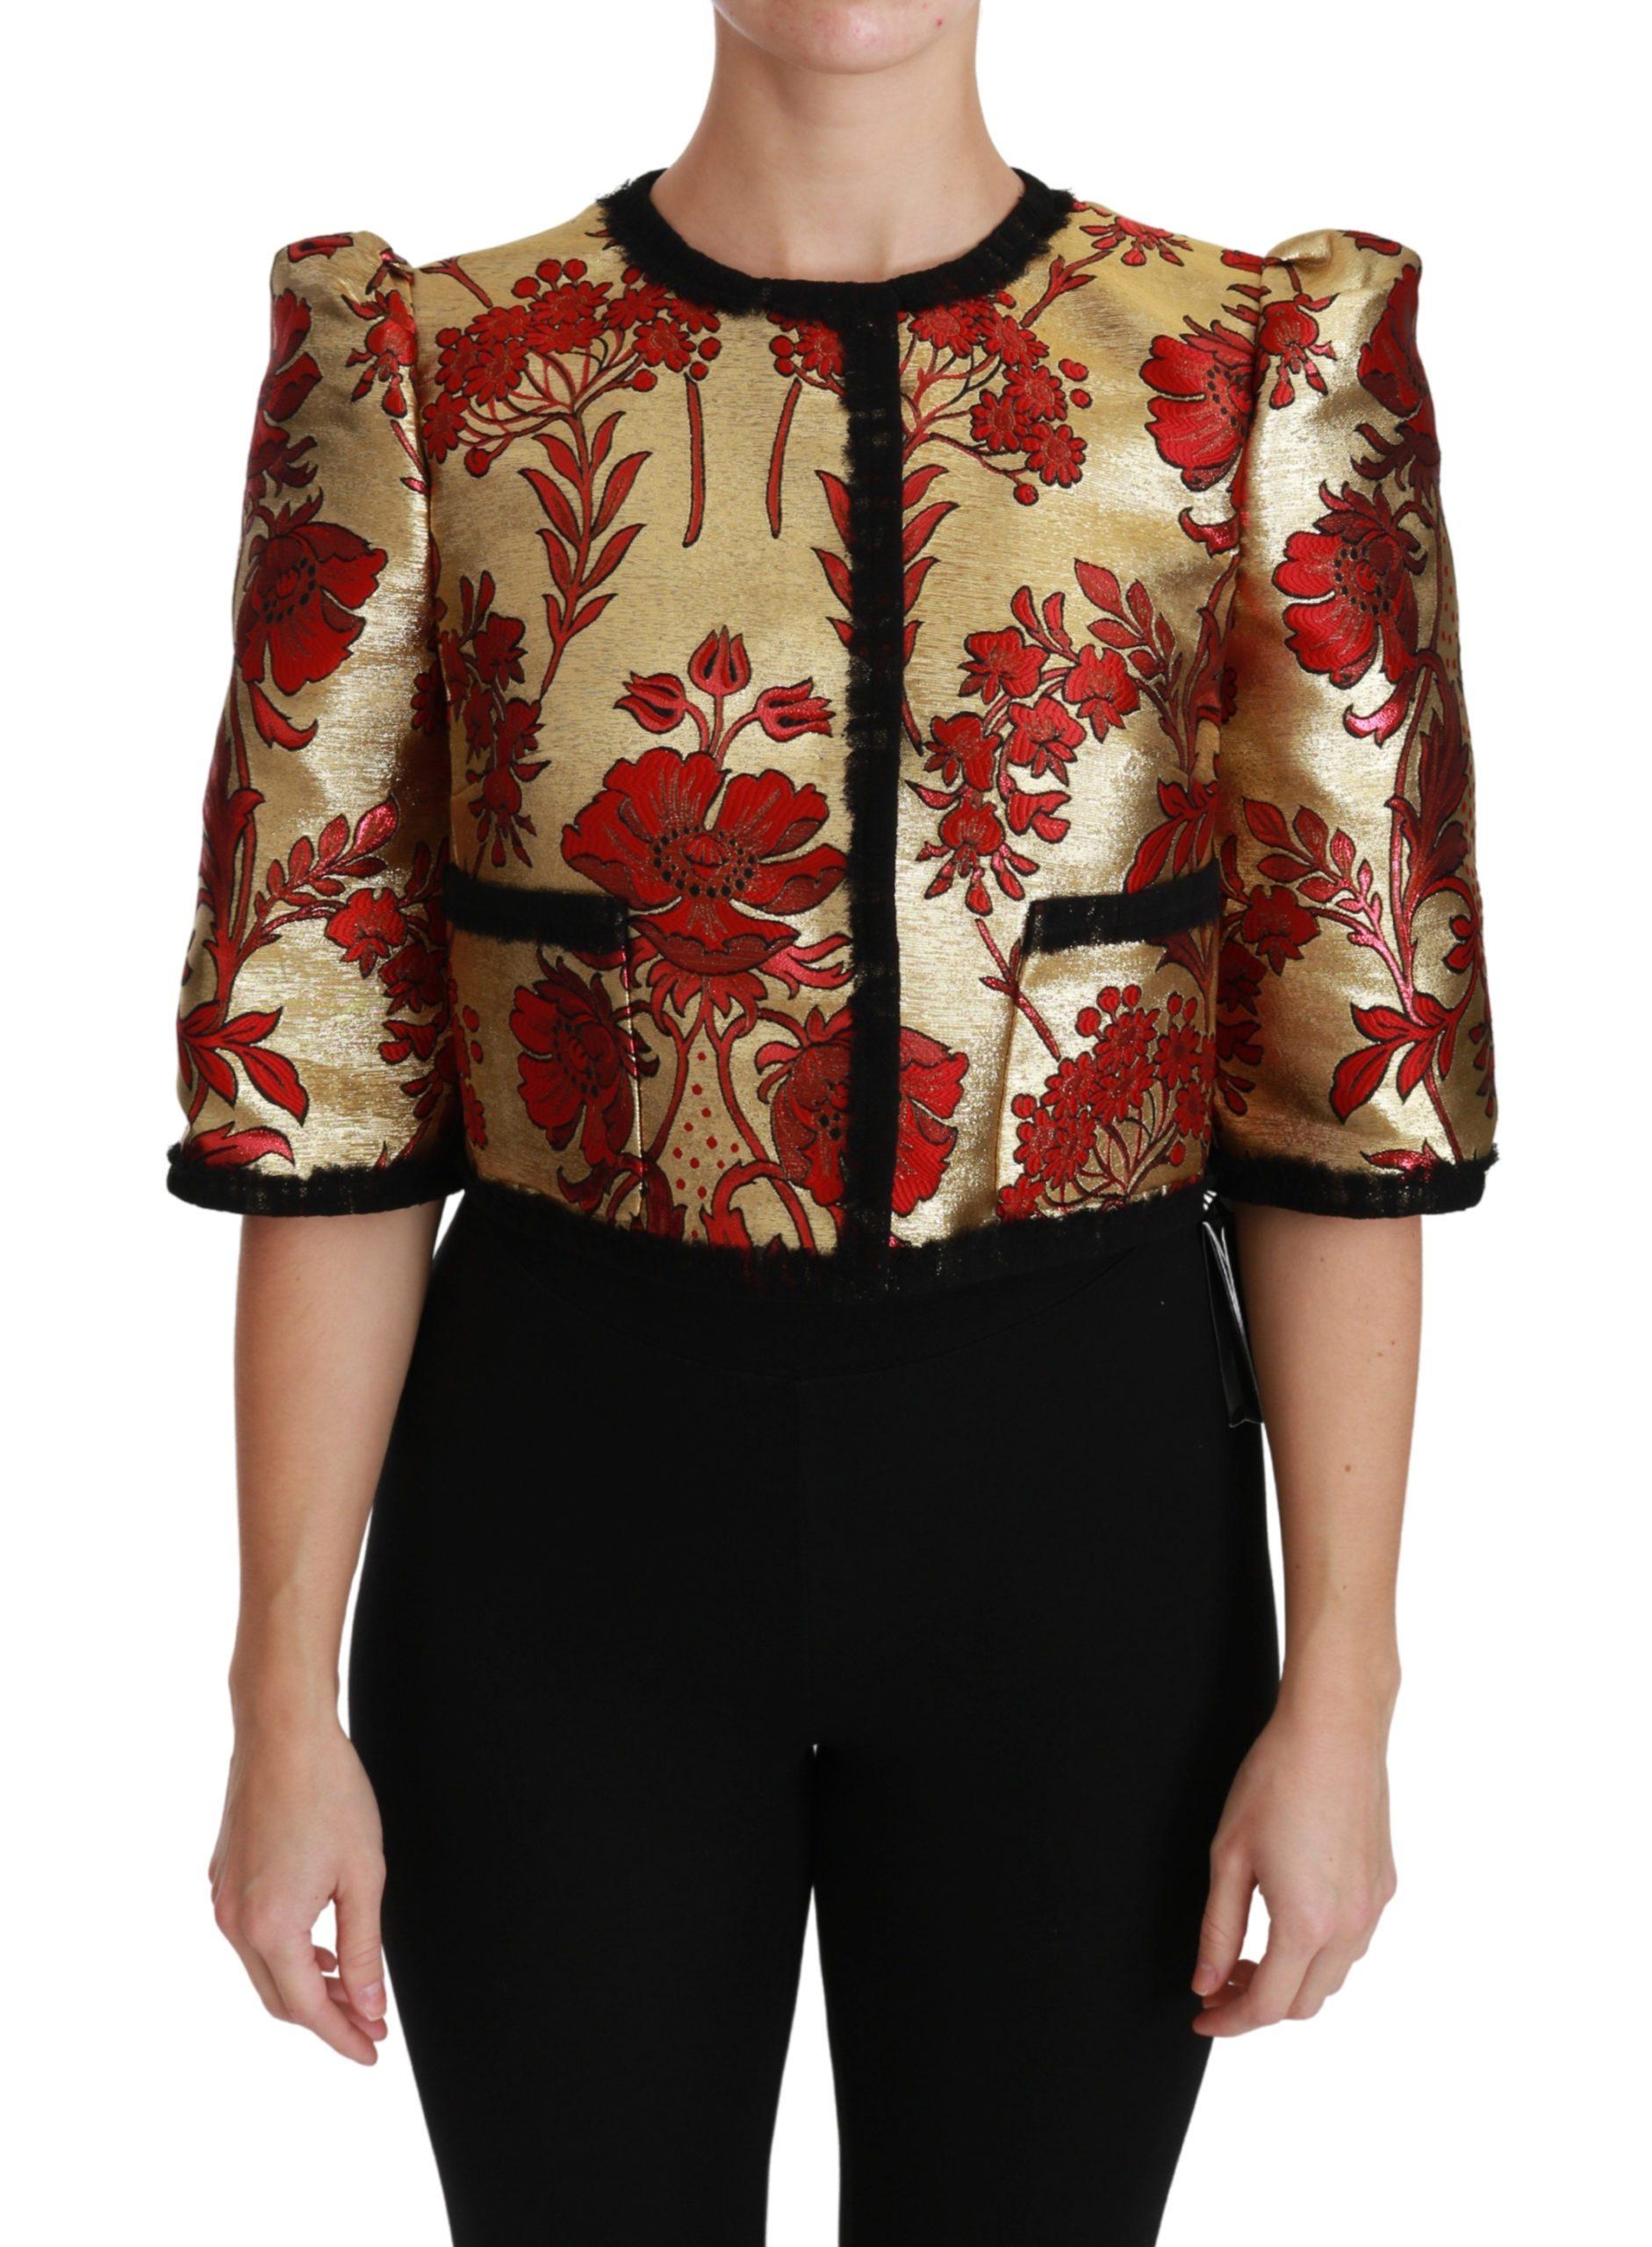 Dolce & Gabbana Women's Floral Brocade Cropped Jacket Red JKT2567 - IT42 M